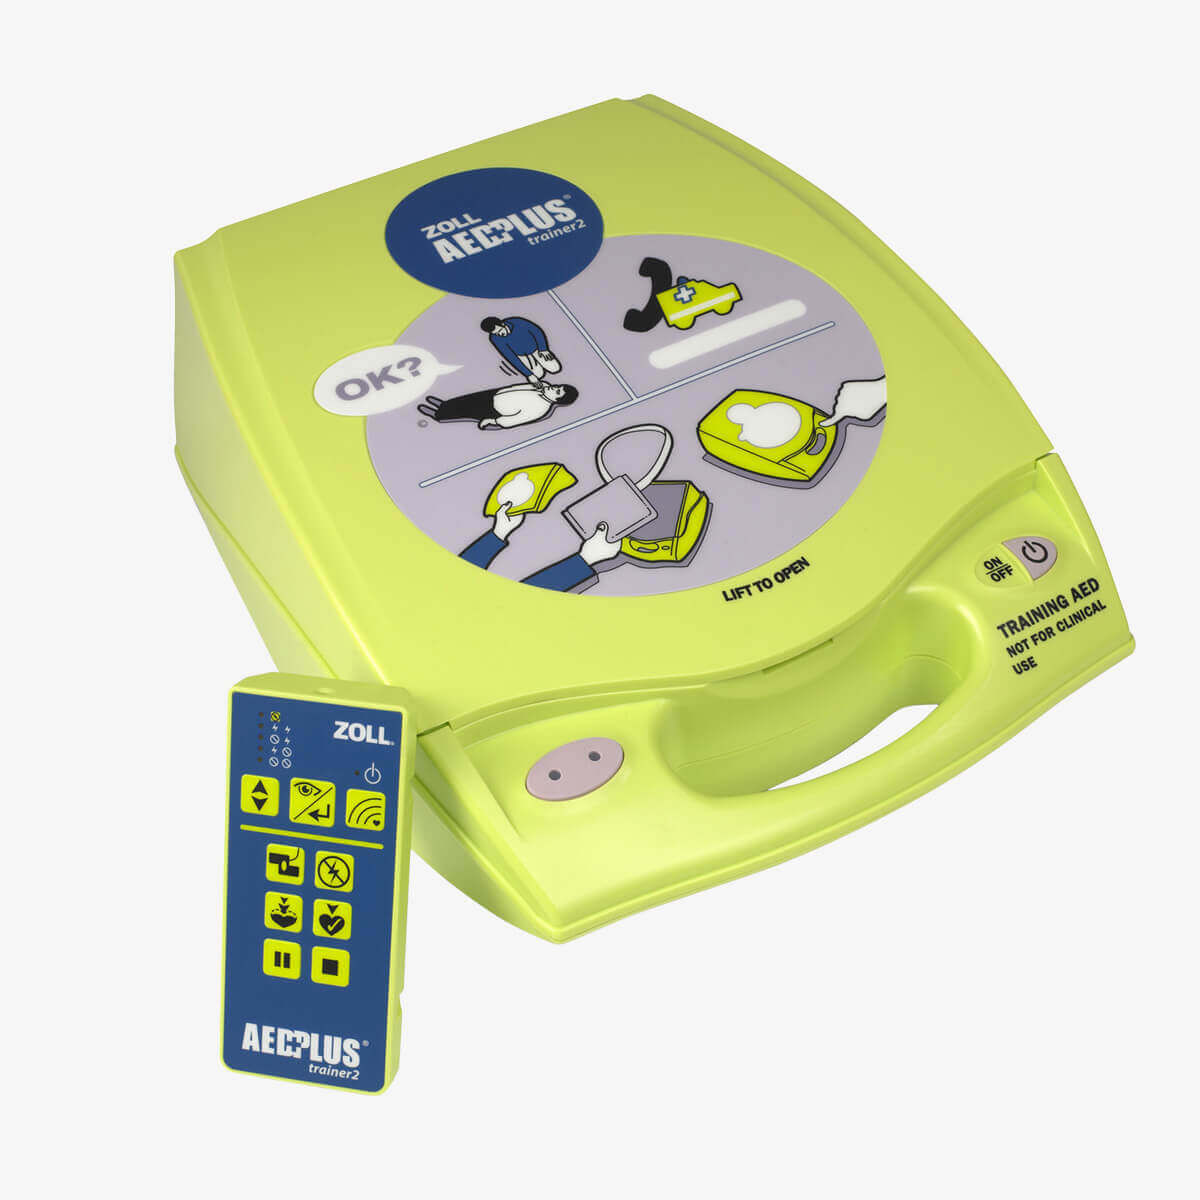 ZOLL AED Plus Trainer2 für das Training des ZOLL AED Plus